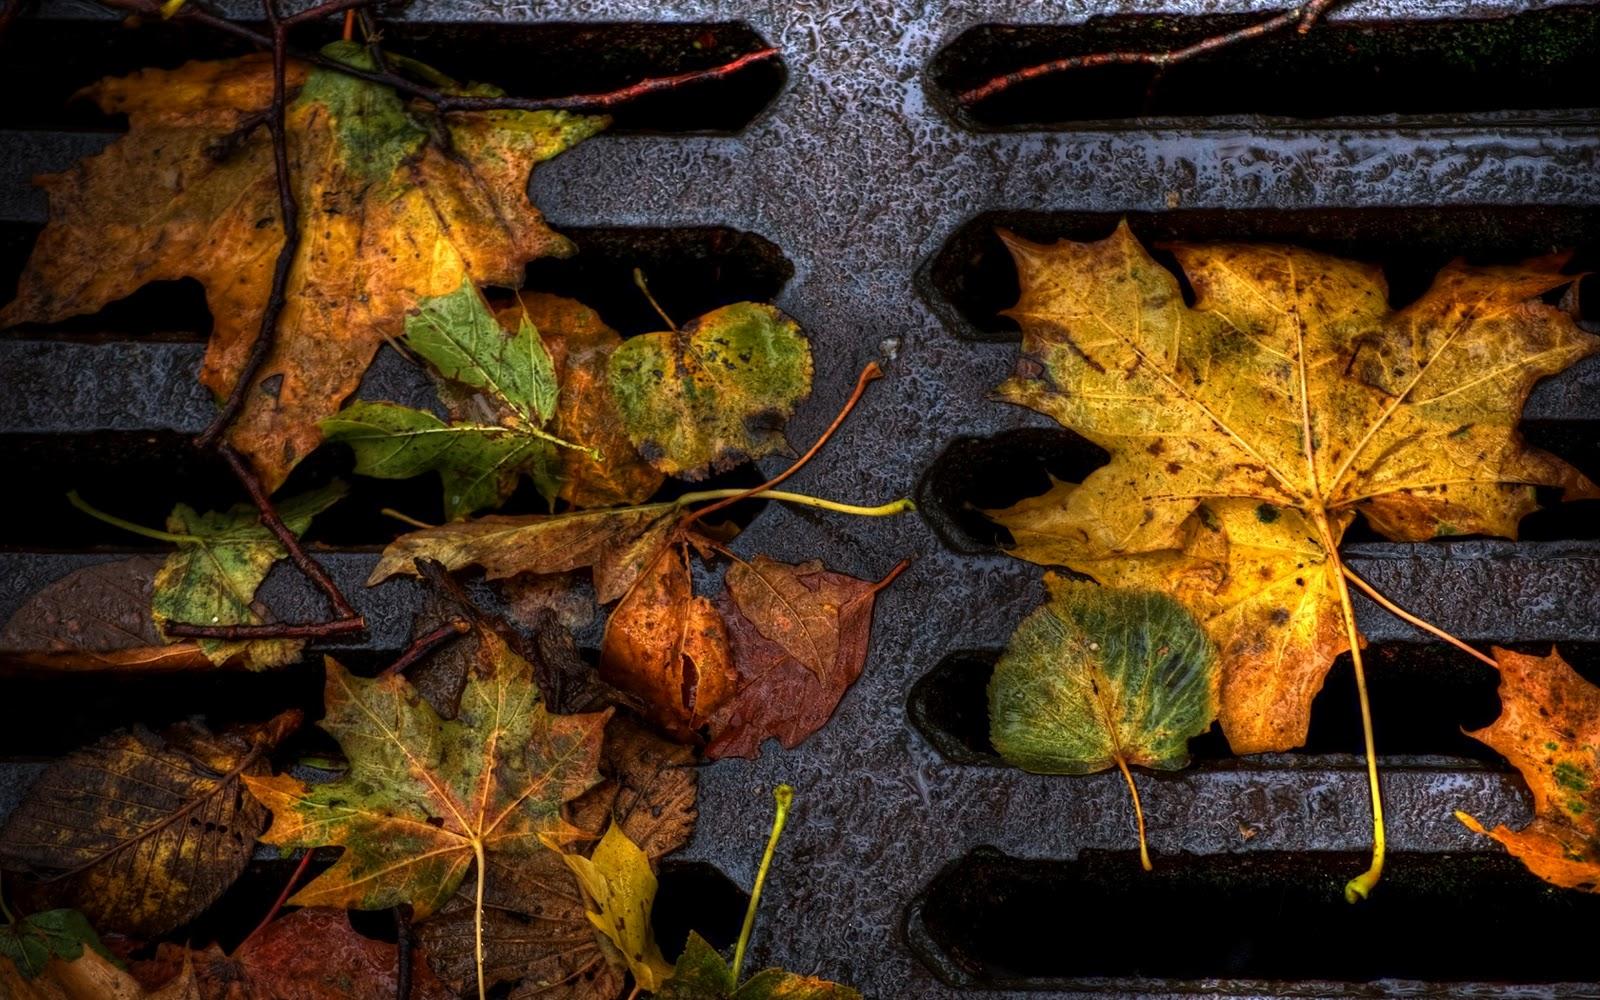 The best top autumn desktop wallpapers 19 En Güzel Sonbahar HD Duvar Kağıtları